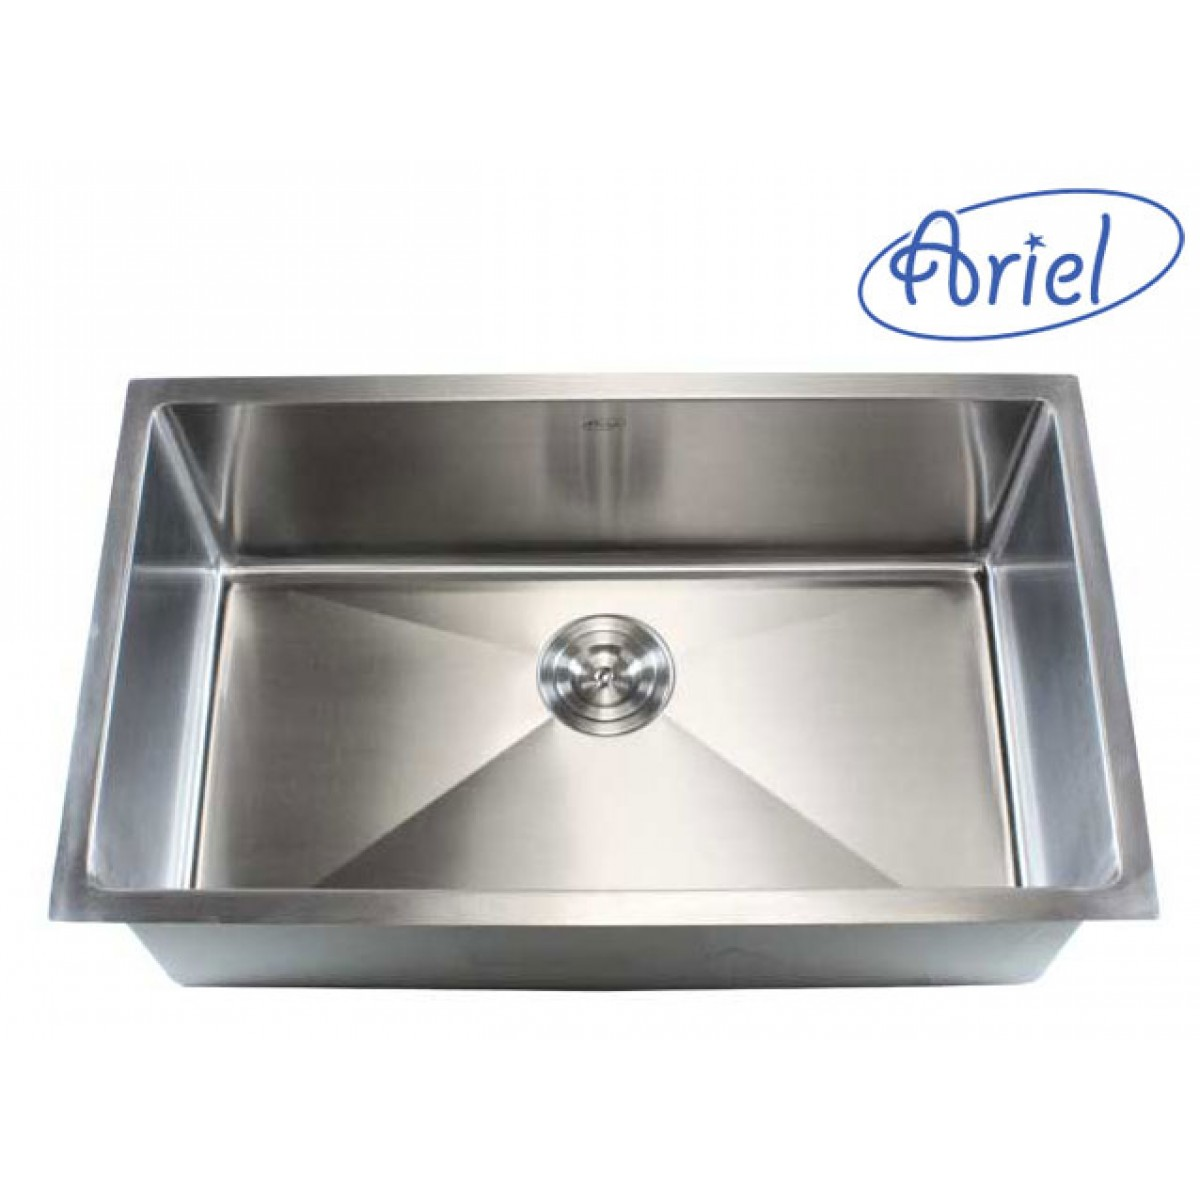 ariel 37 inch stainless steel undermount 50/50 double bowl kitchen